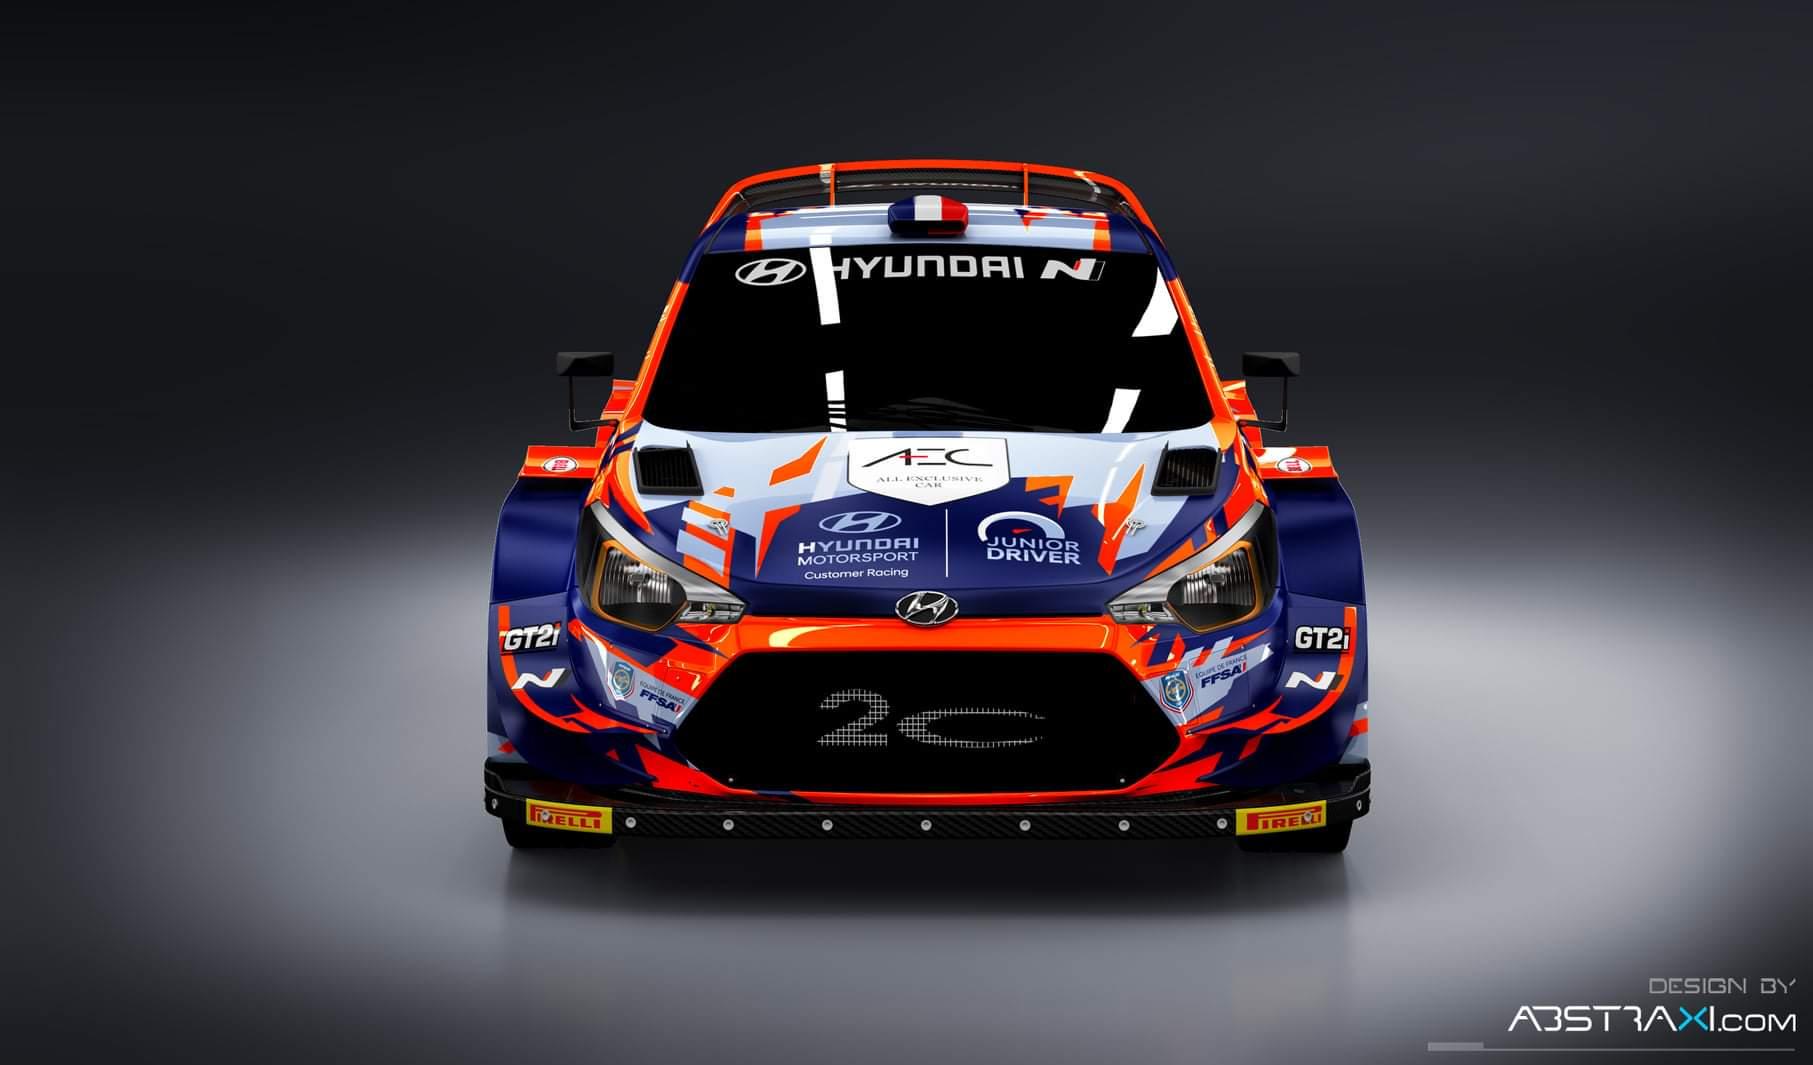 World Rally Championship: Temporada 2021  - Página 3 ErYyXBTXMAMn9Sx?format=jpg&name=large